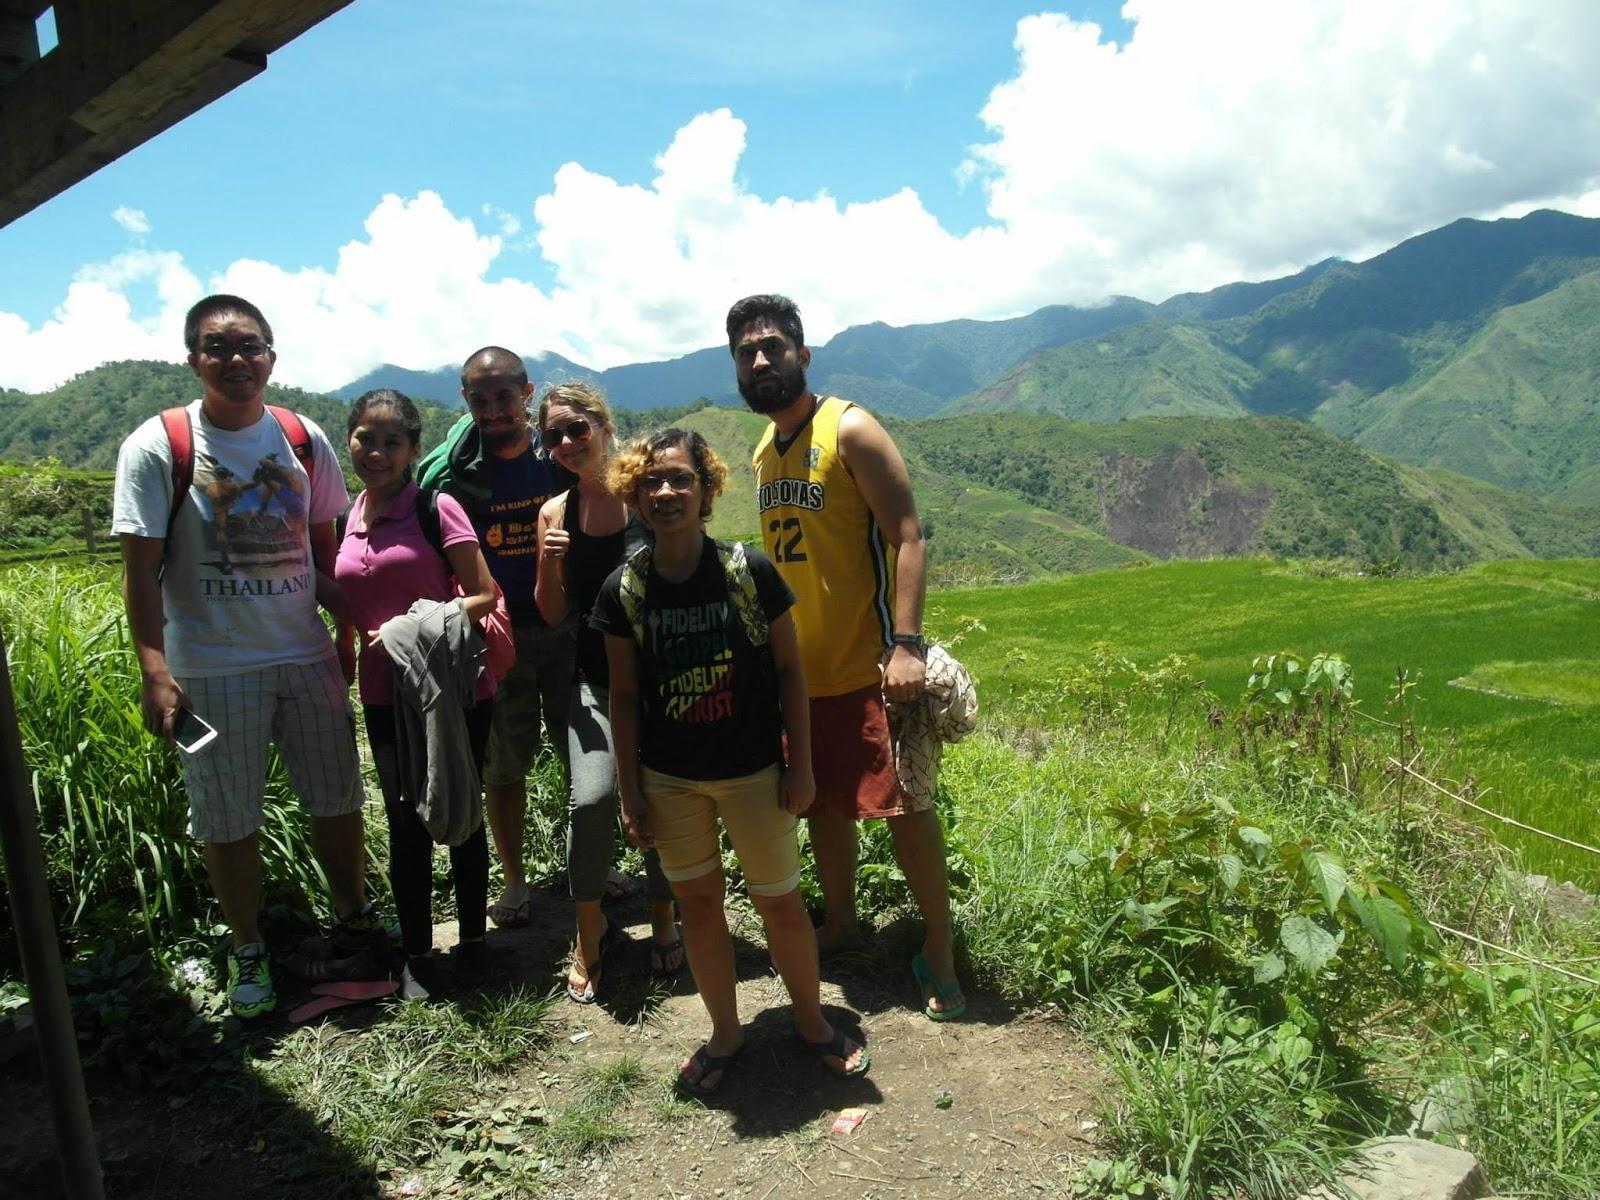 Buscalan, Kalinga - WeTravelFearlessly